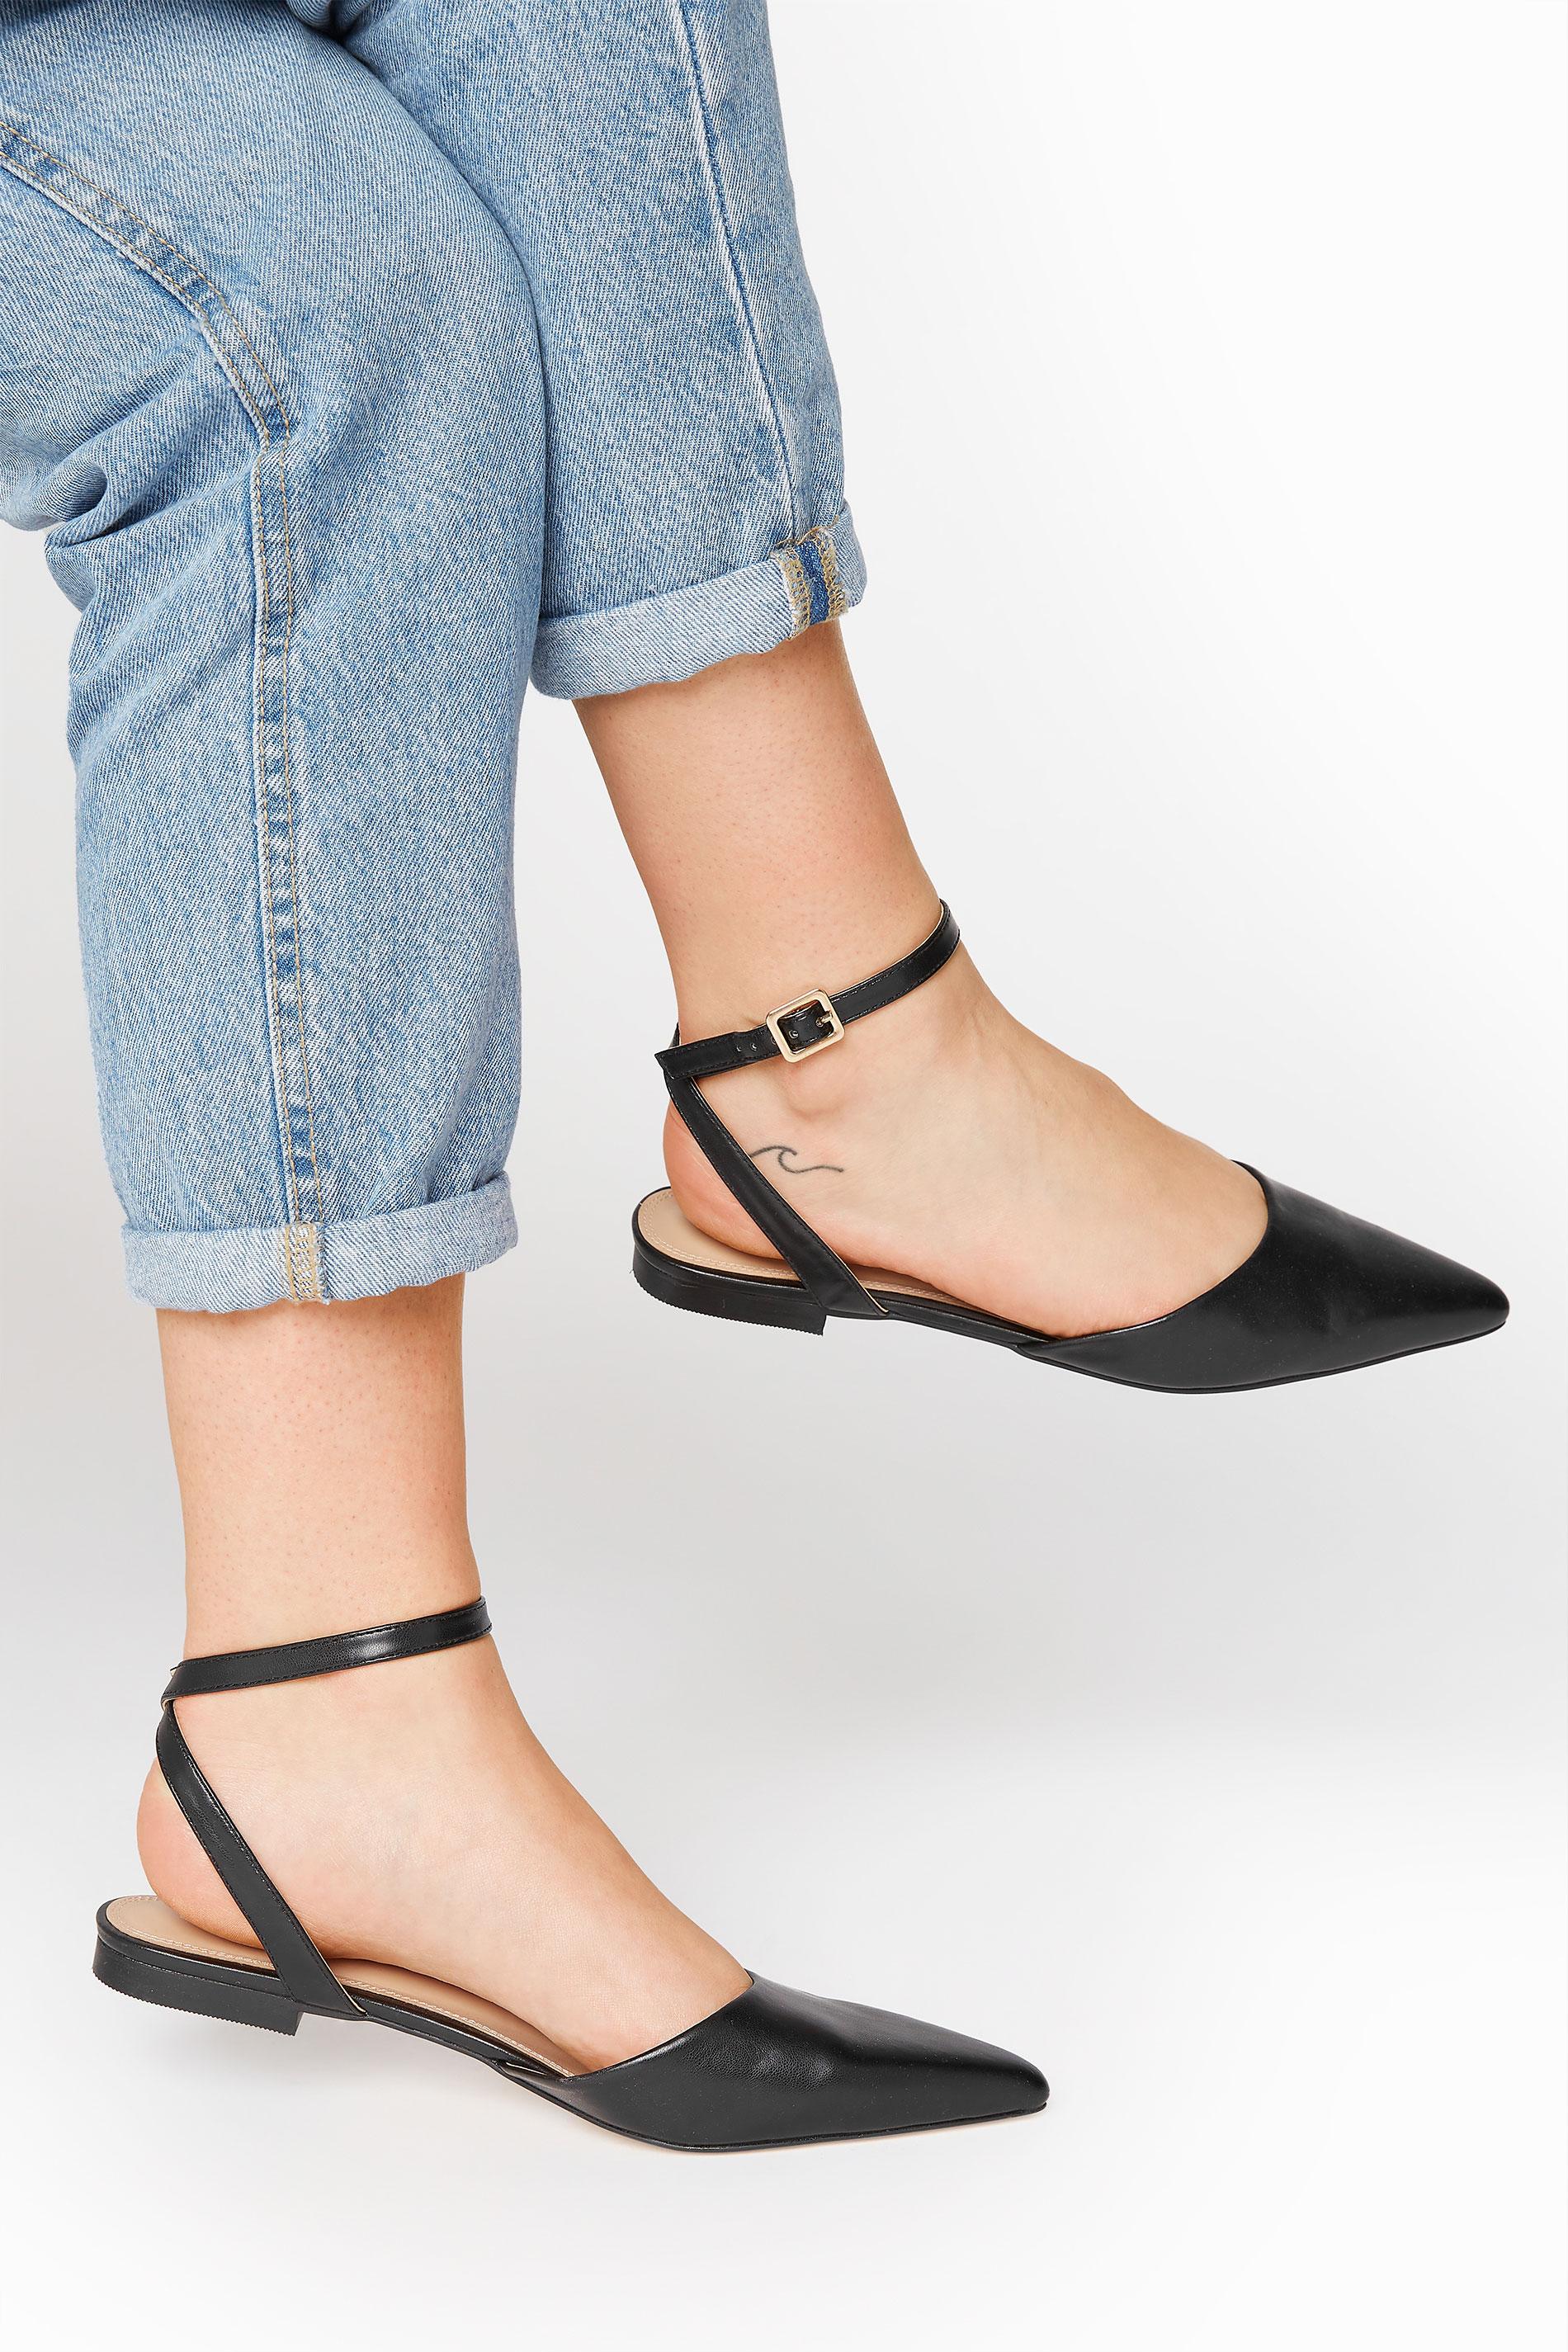 LTS Black Two Part Point Shoes_M.jpg